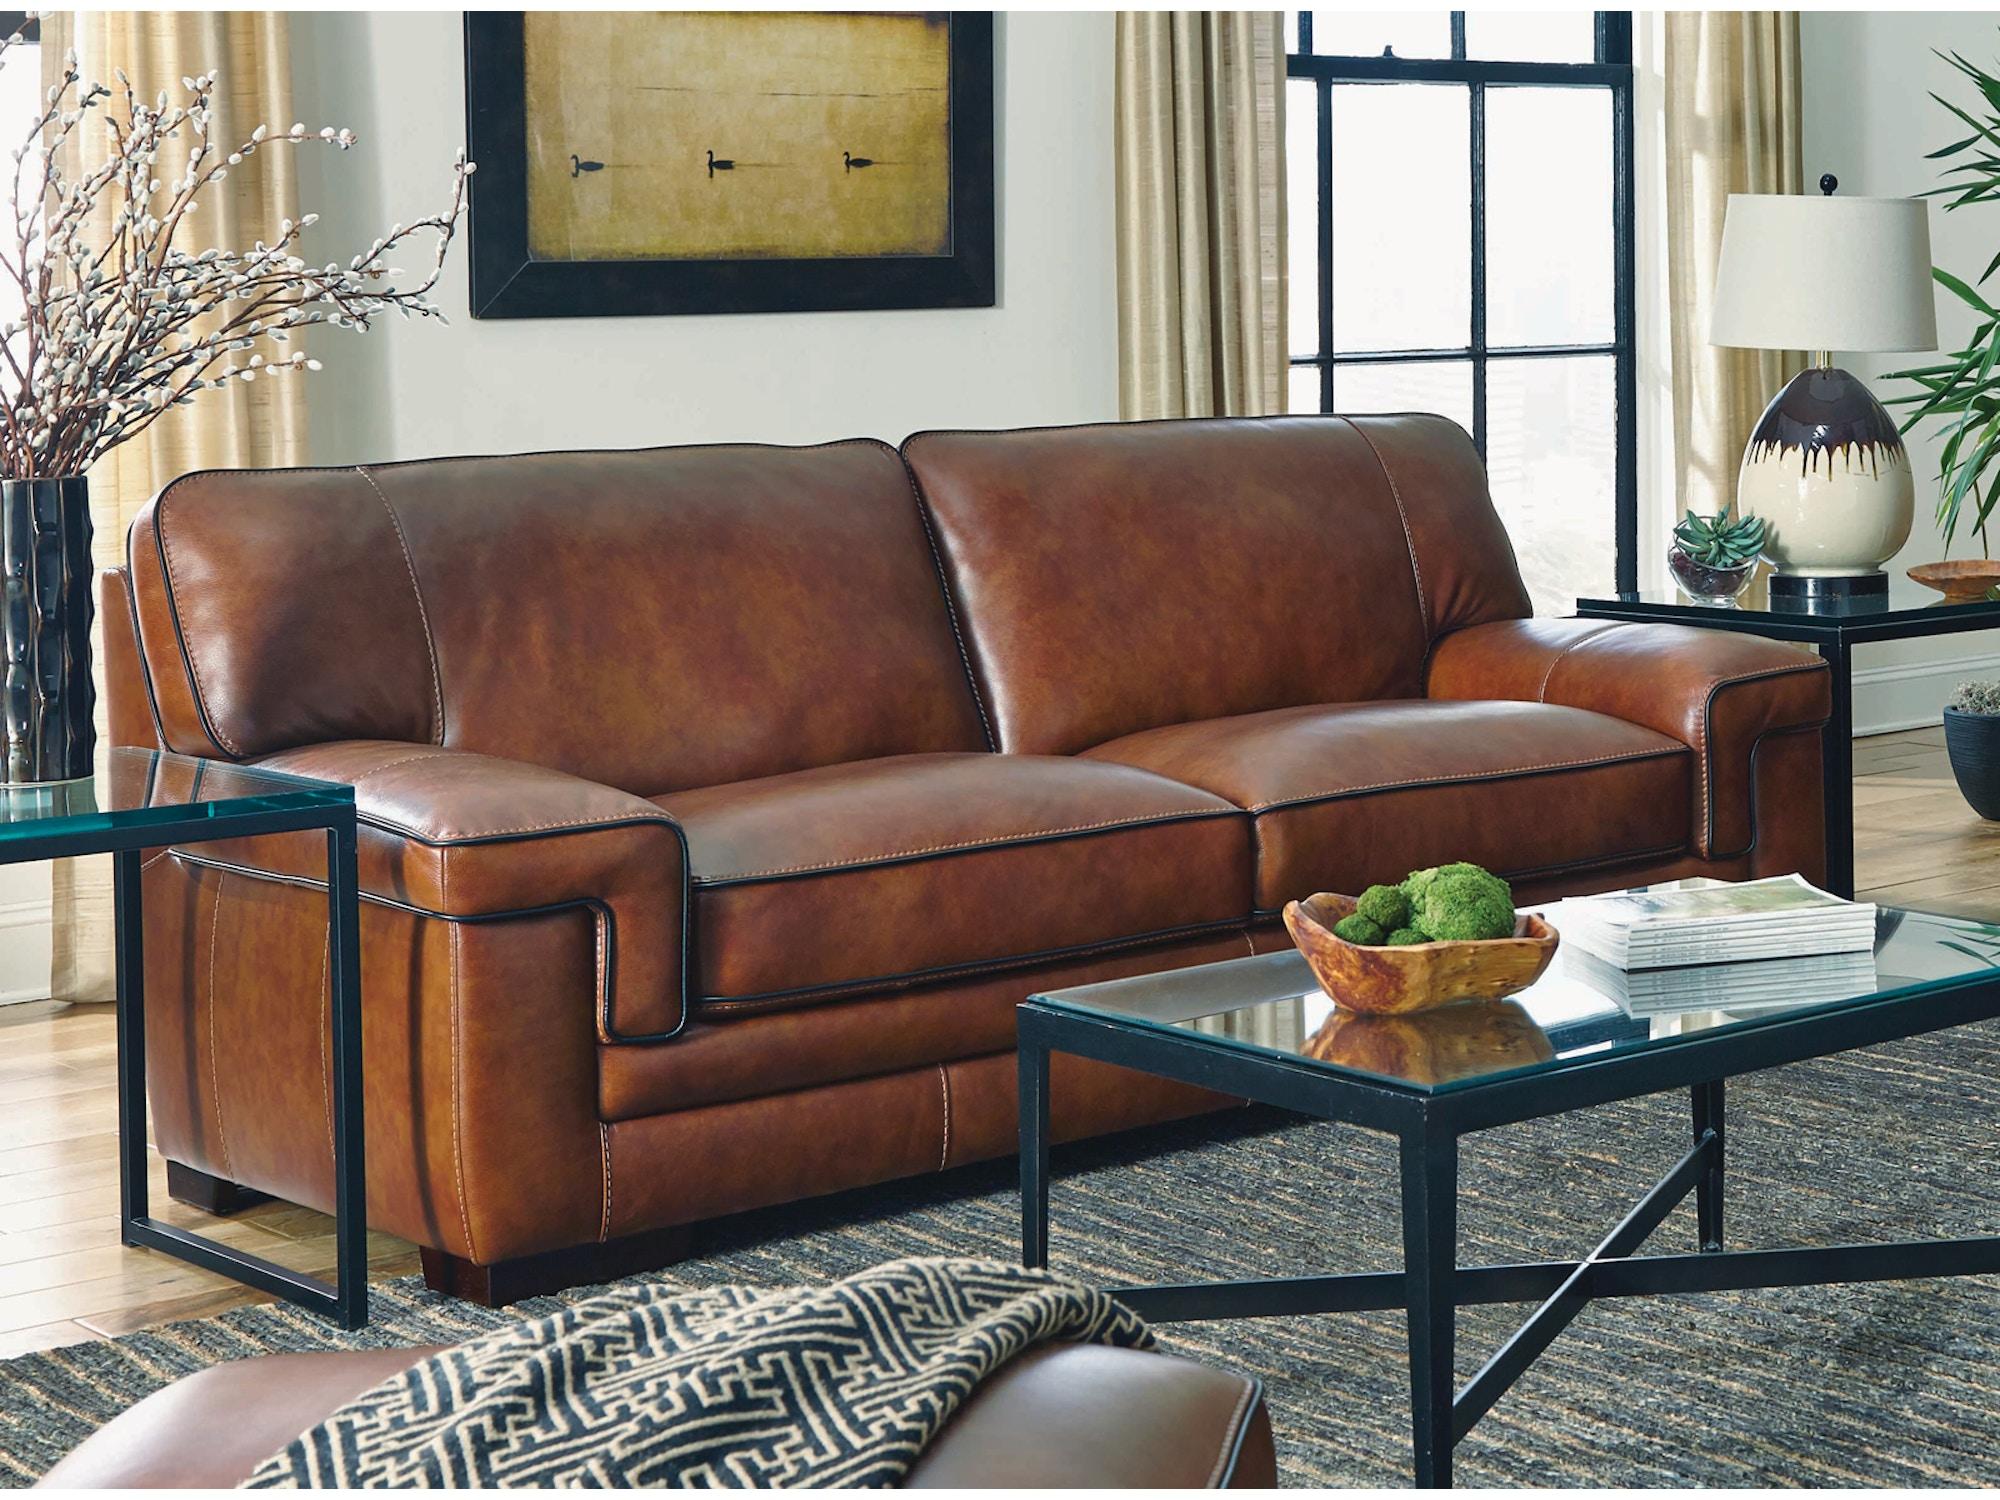 Sofas Cincinnati Bernhardt Living Room Foster Leather Sofa 031220 Furniture Fair Thesofa